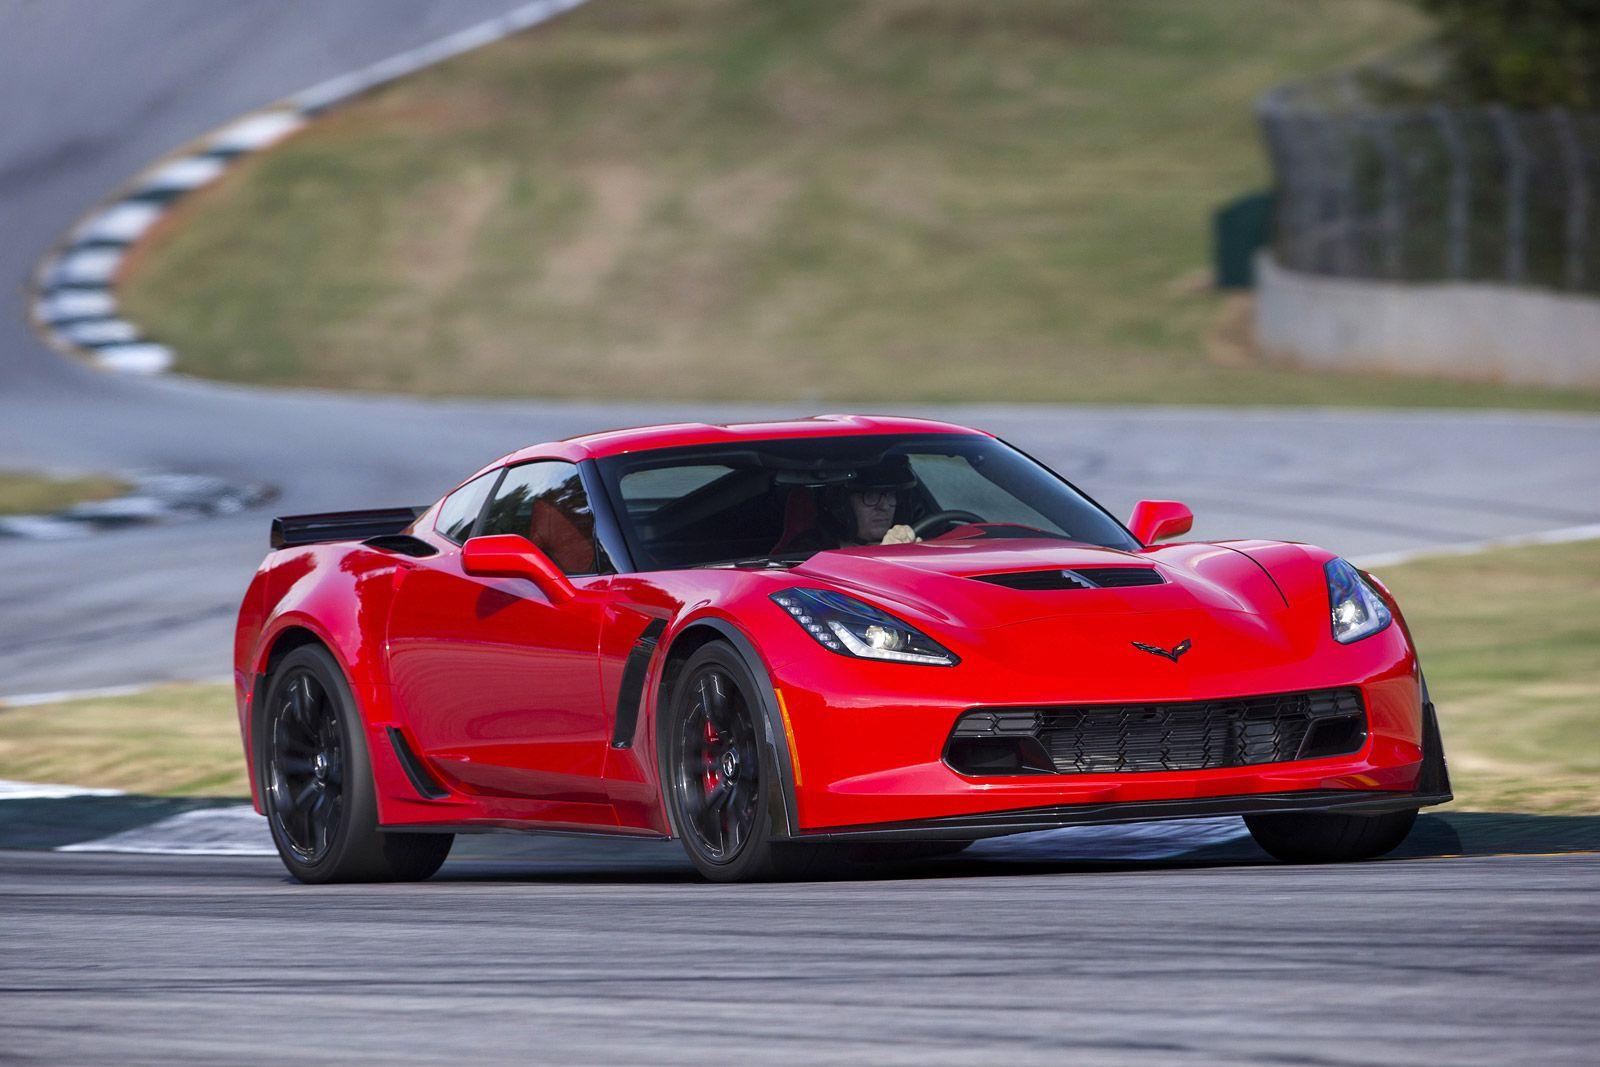 2017 Corvette Stingray Quarter Mile Run